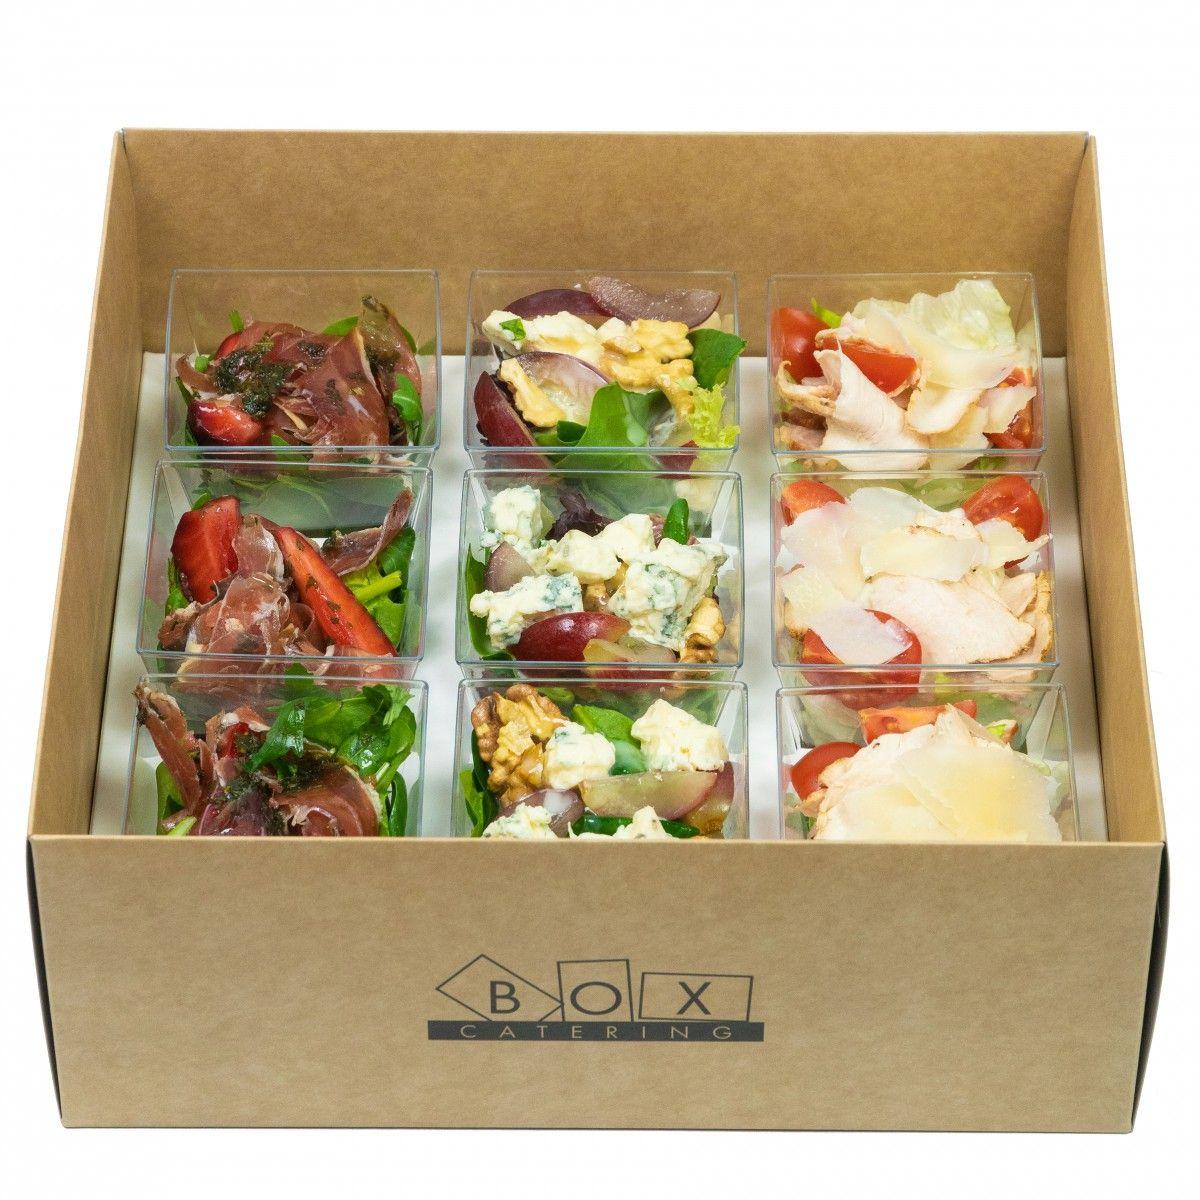 Chef salads smart box фото 2